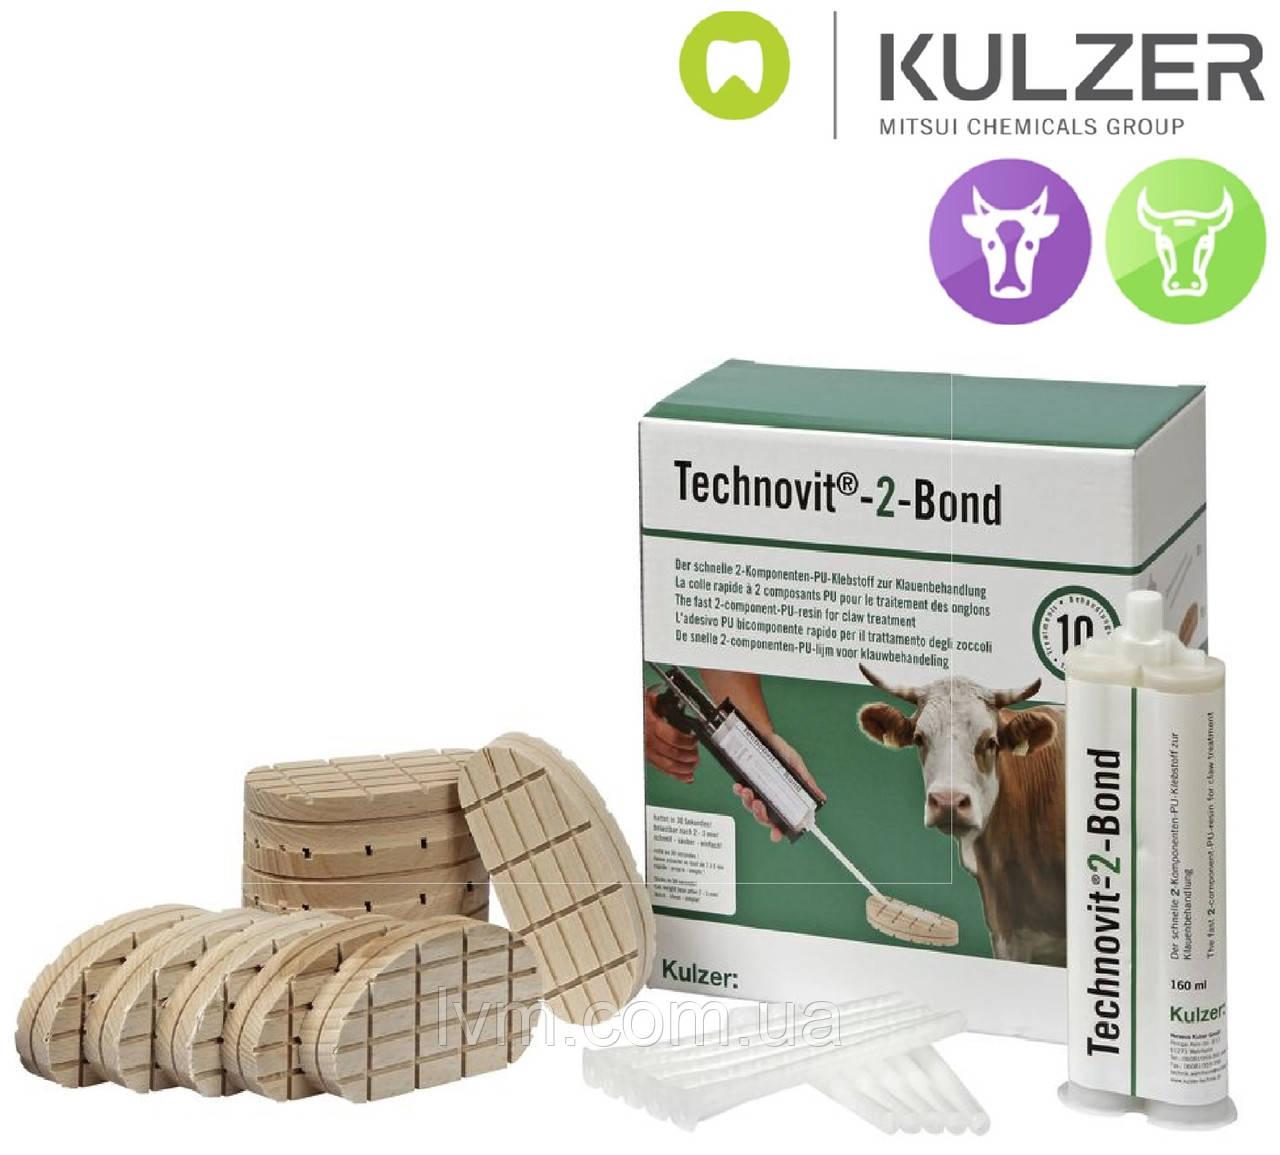 Комплект для лечения копыт Technovit-2-BOND Техновит-2-Бонд, на 10 колодок, без дозатора KULZER